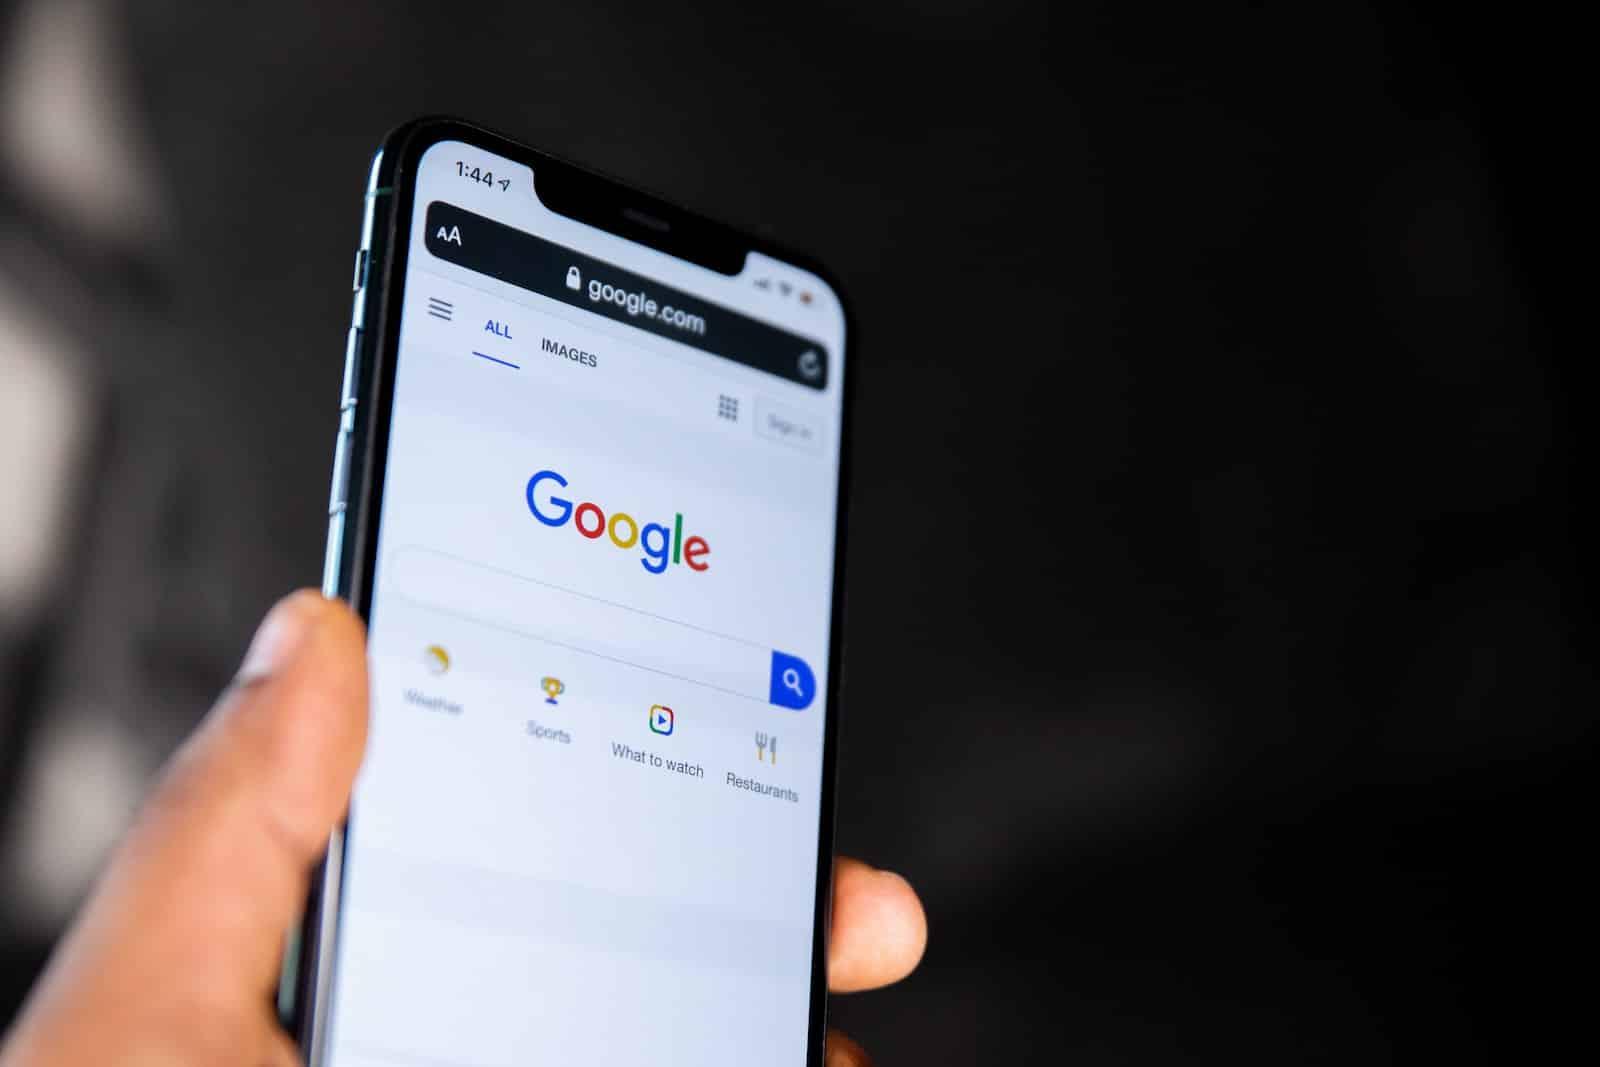 Ricerca sul motore di ricerca di Google